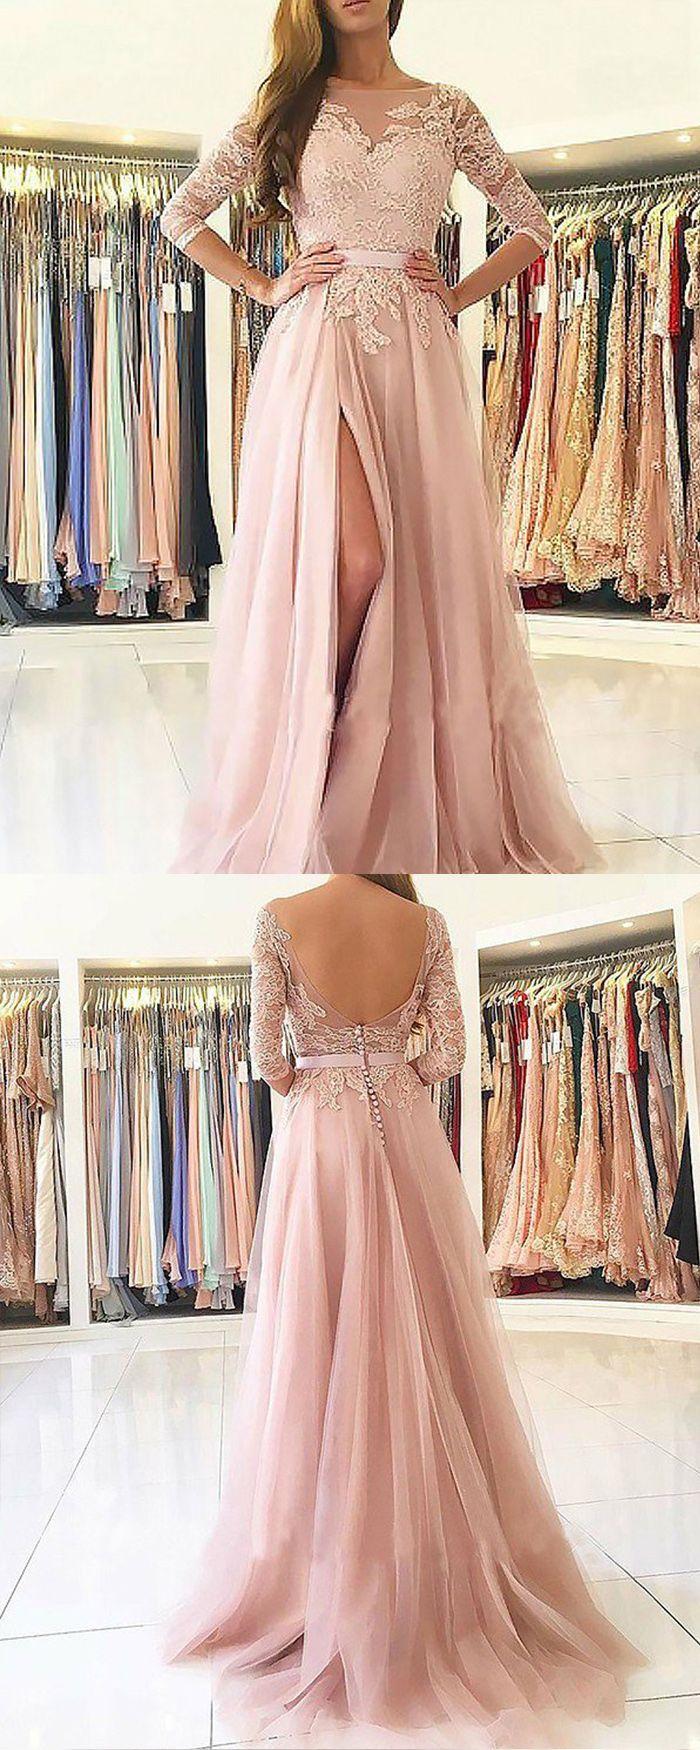 cec65f7c318 jewel lace appliqued pink tulle slit prom dress, long sleeve pink formal  dress